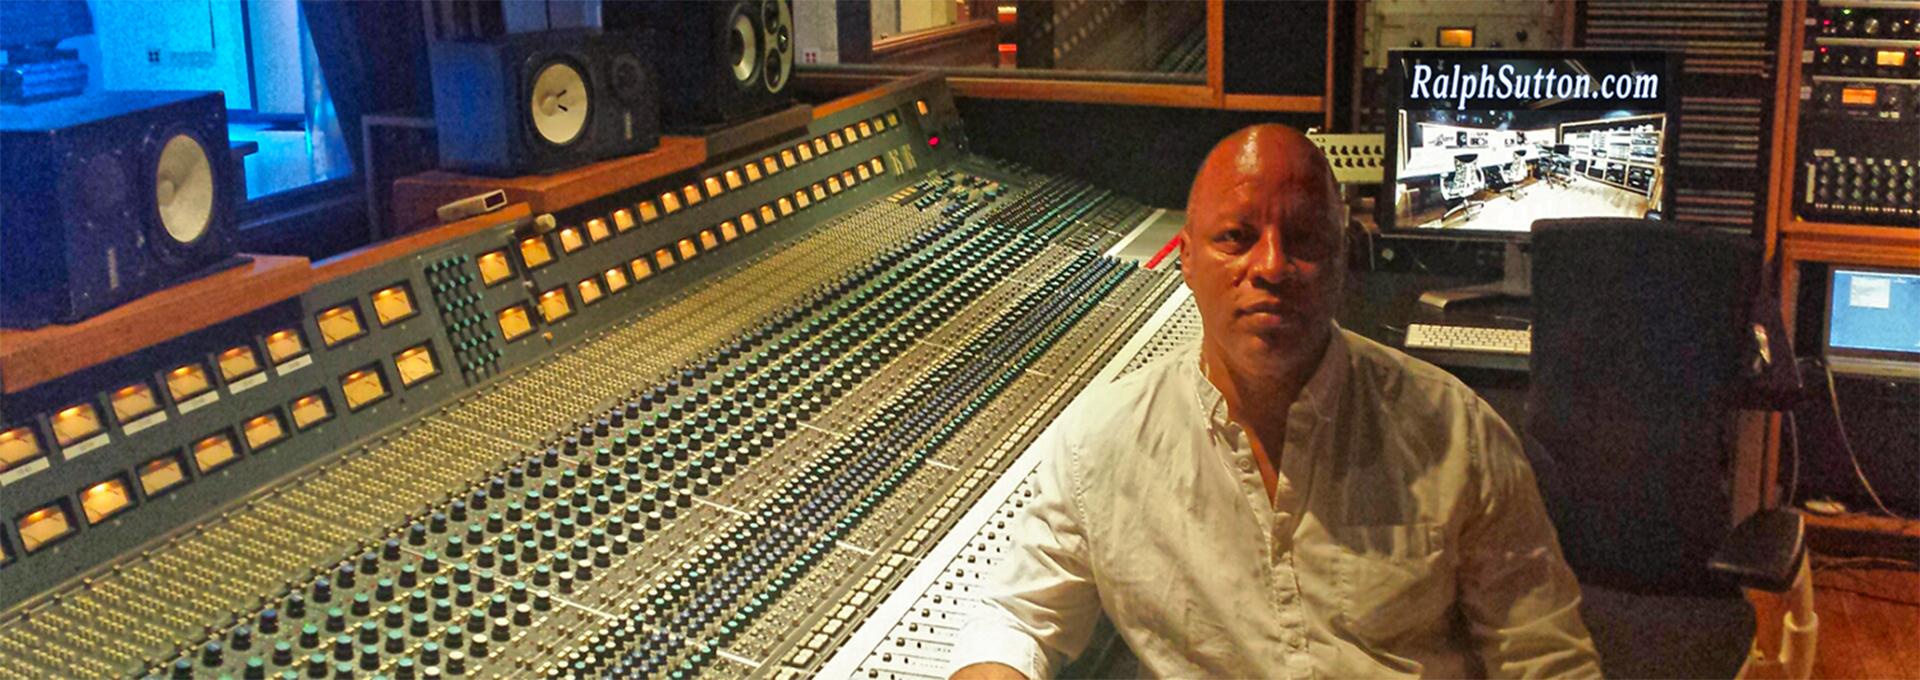 Ralphsutton.com_biography_of_recording_engineer_ralph_sutton_090915